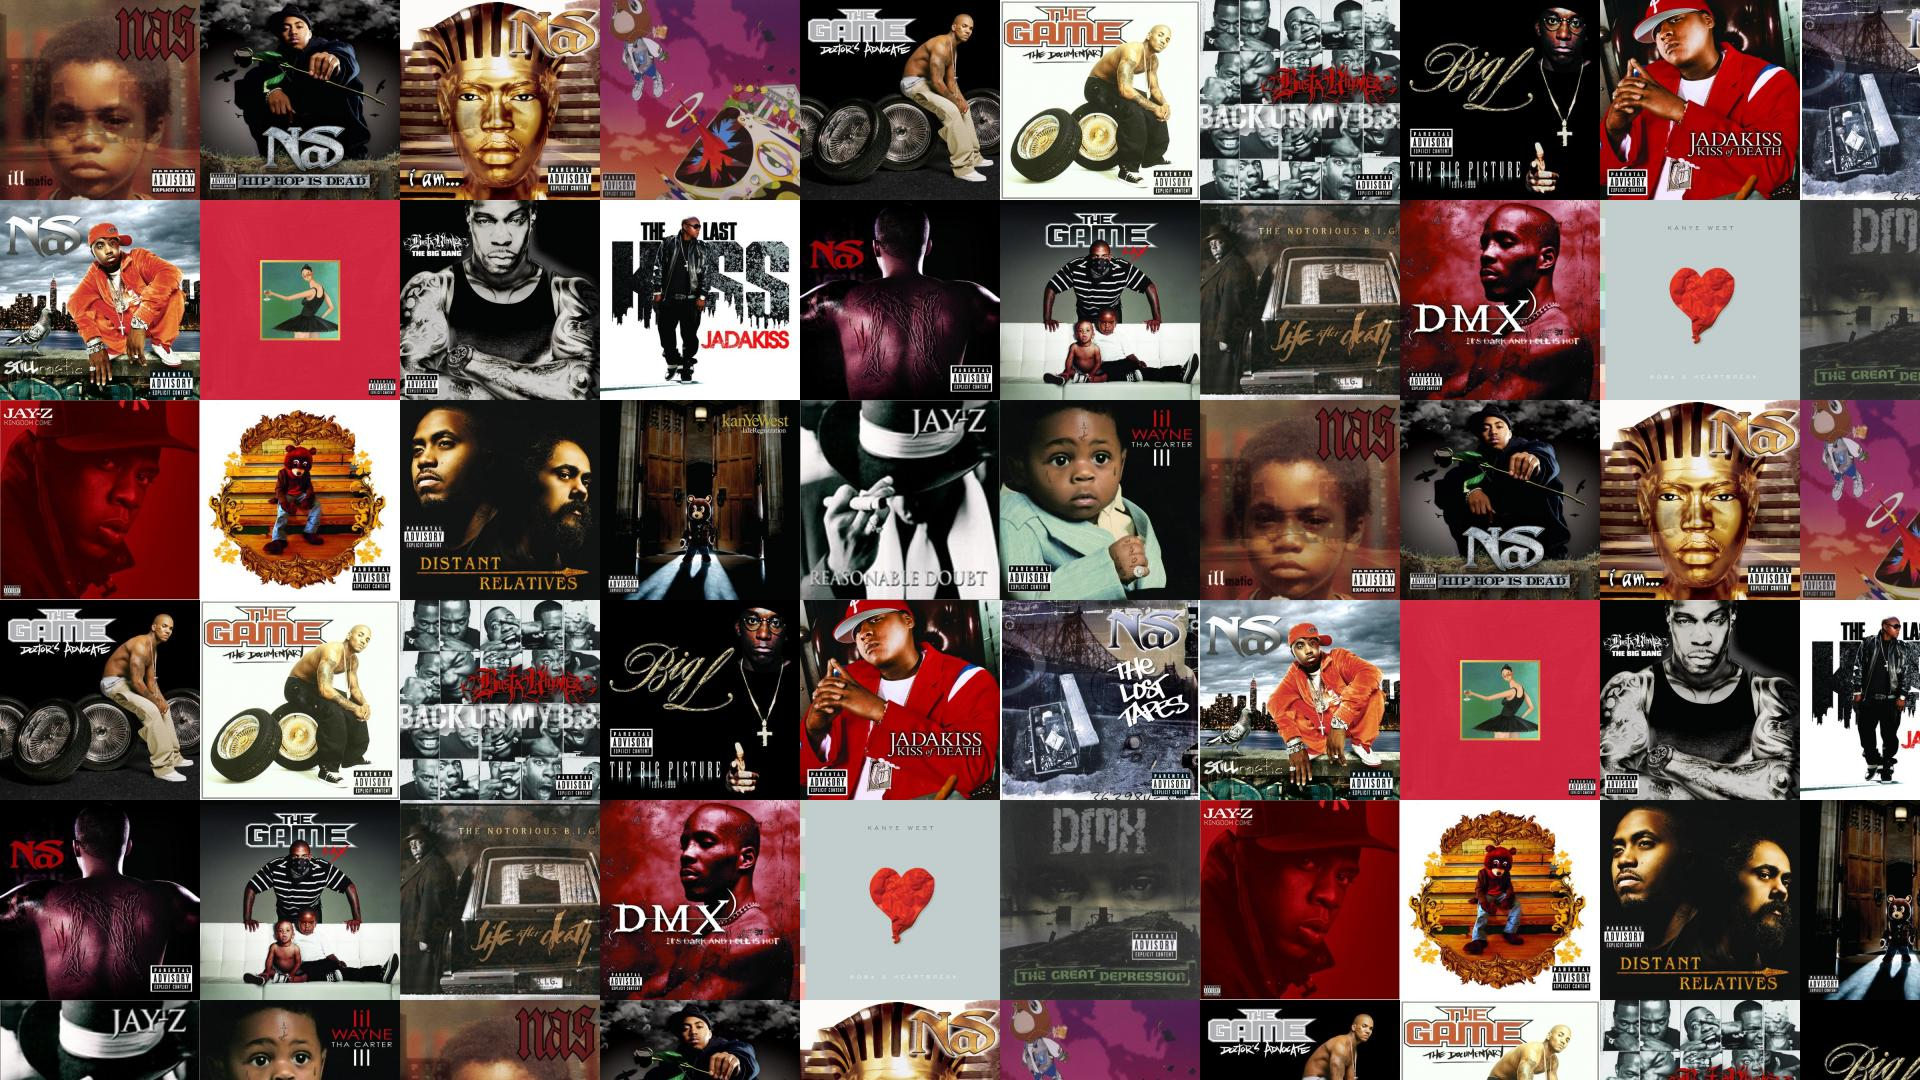 Top 100 Hip Hop R&b Download Torrent